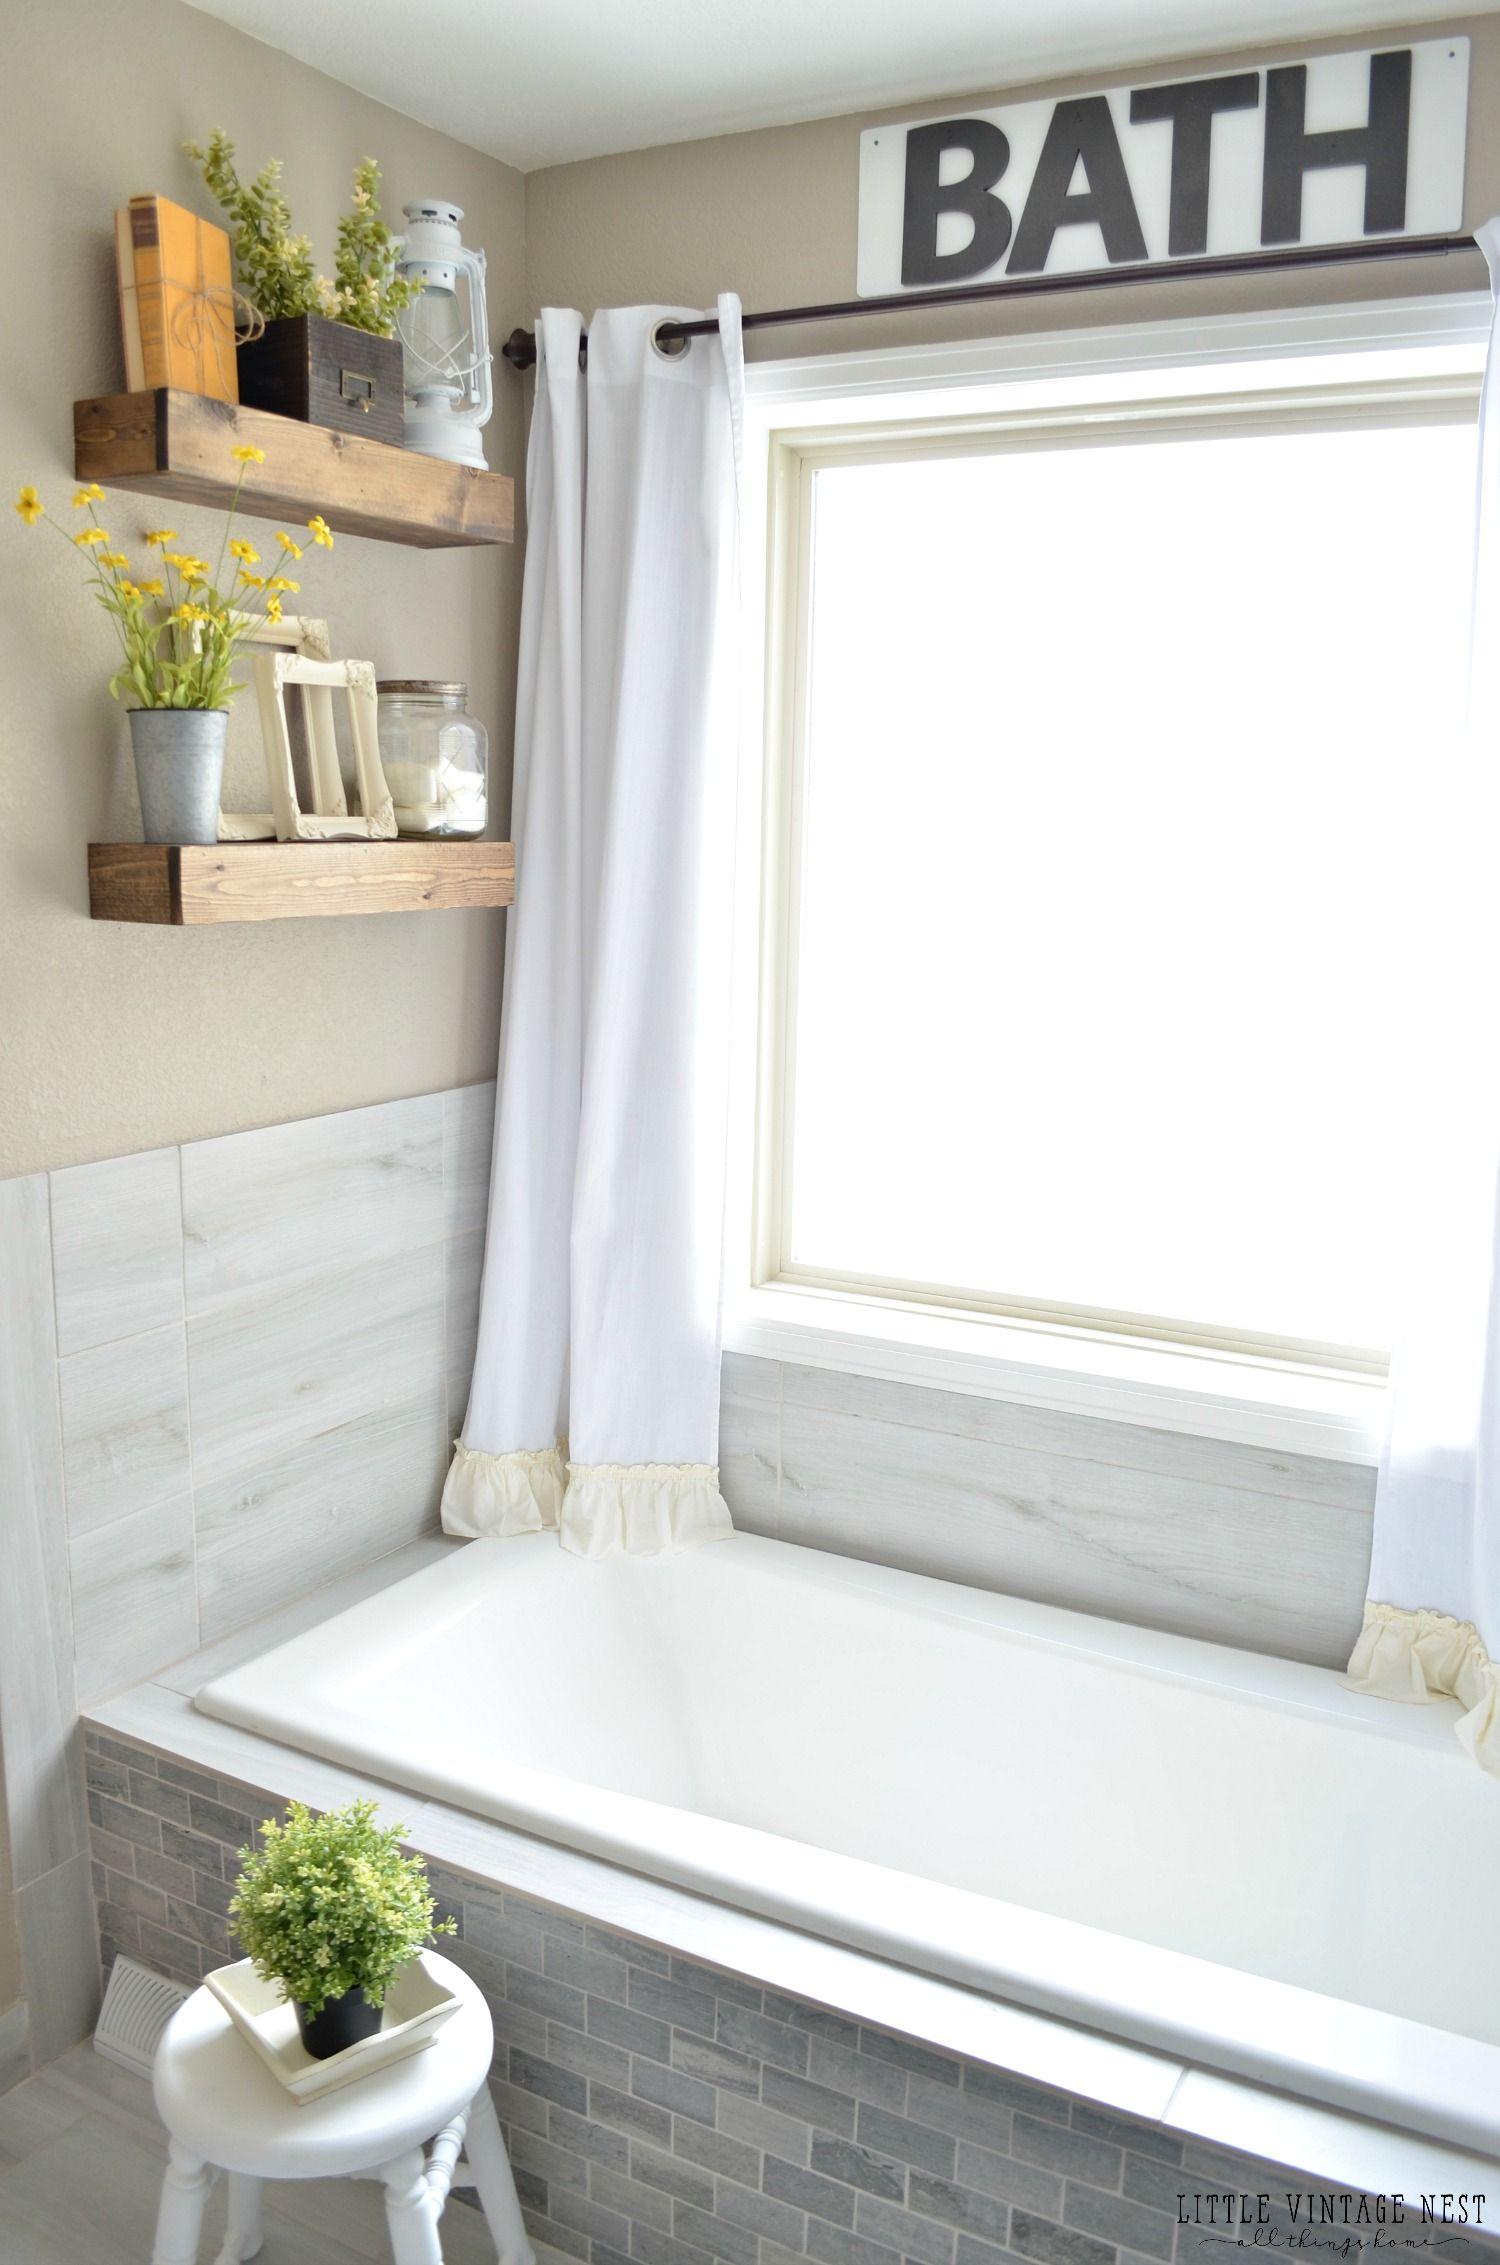 farmhouse master bathroom reveal bathing beauty bathroom rh pinterest com how to decorate a bathroom window sill how do you decorate a bathroom window